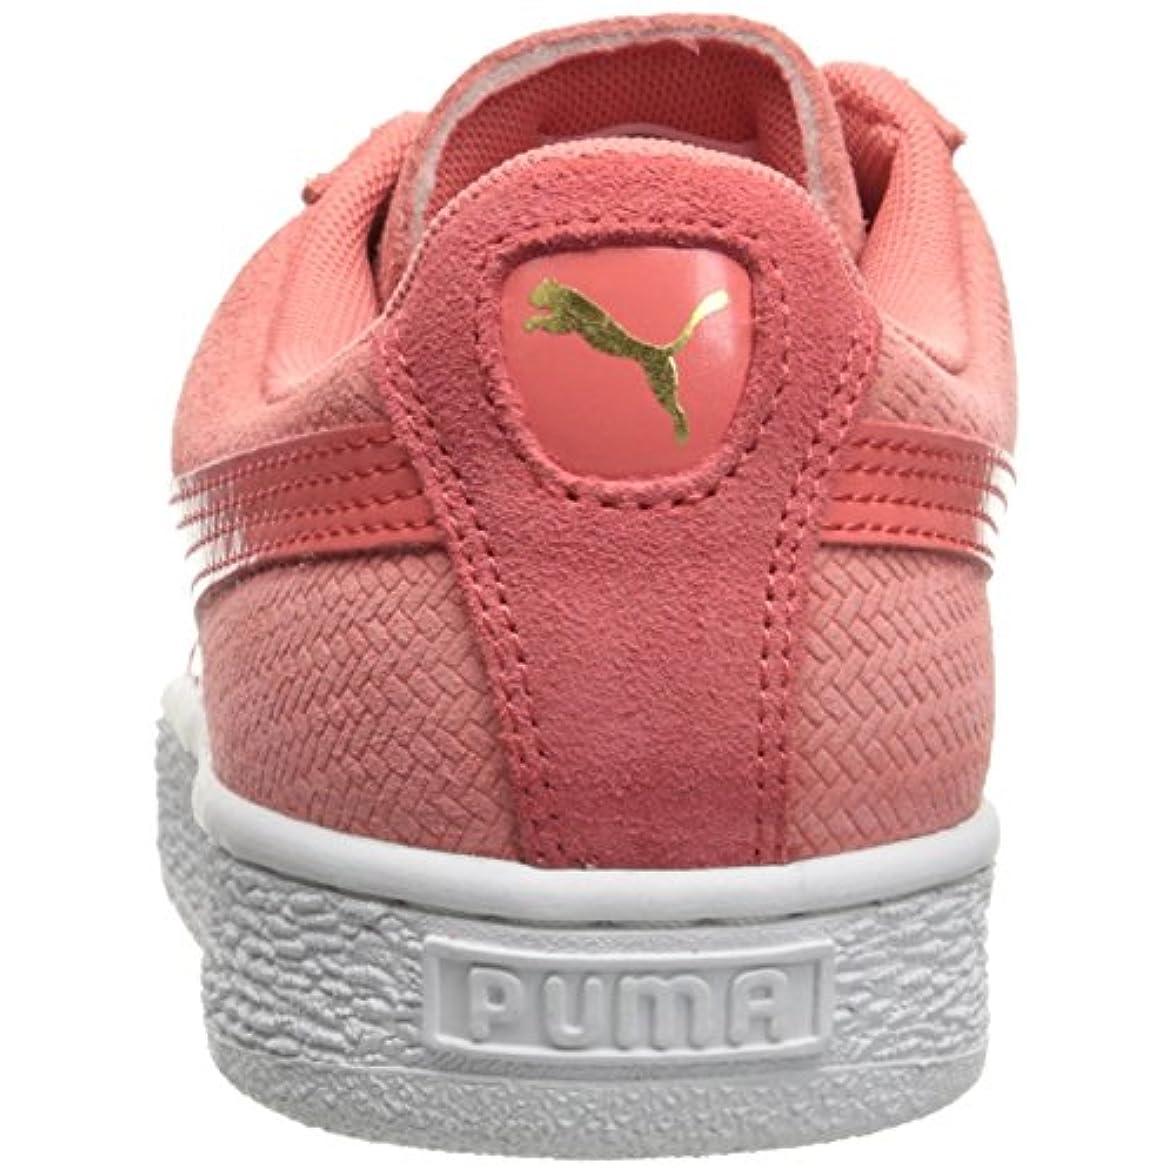 Puma Pumabasket Remaster Wn's-w - Basket Donna Da Uomo